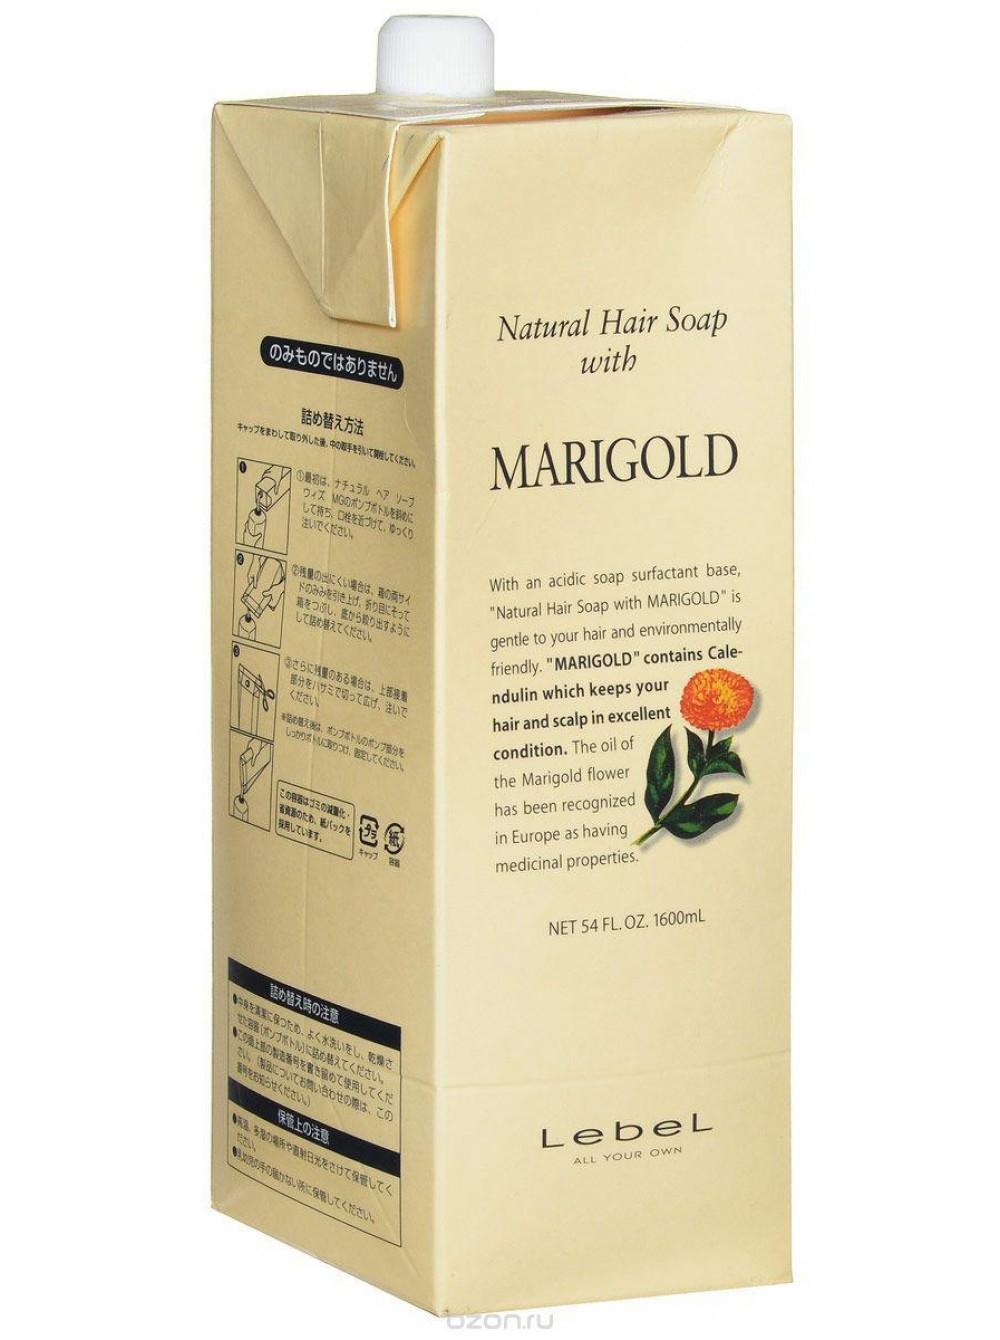 Lebel Cosmetics Шампунь Hair Soap With Marigold Календула, 1600 мл lebel natural hair soap treatment marigold шампунь с календулой 240 мл